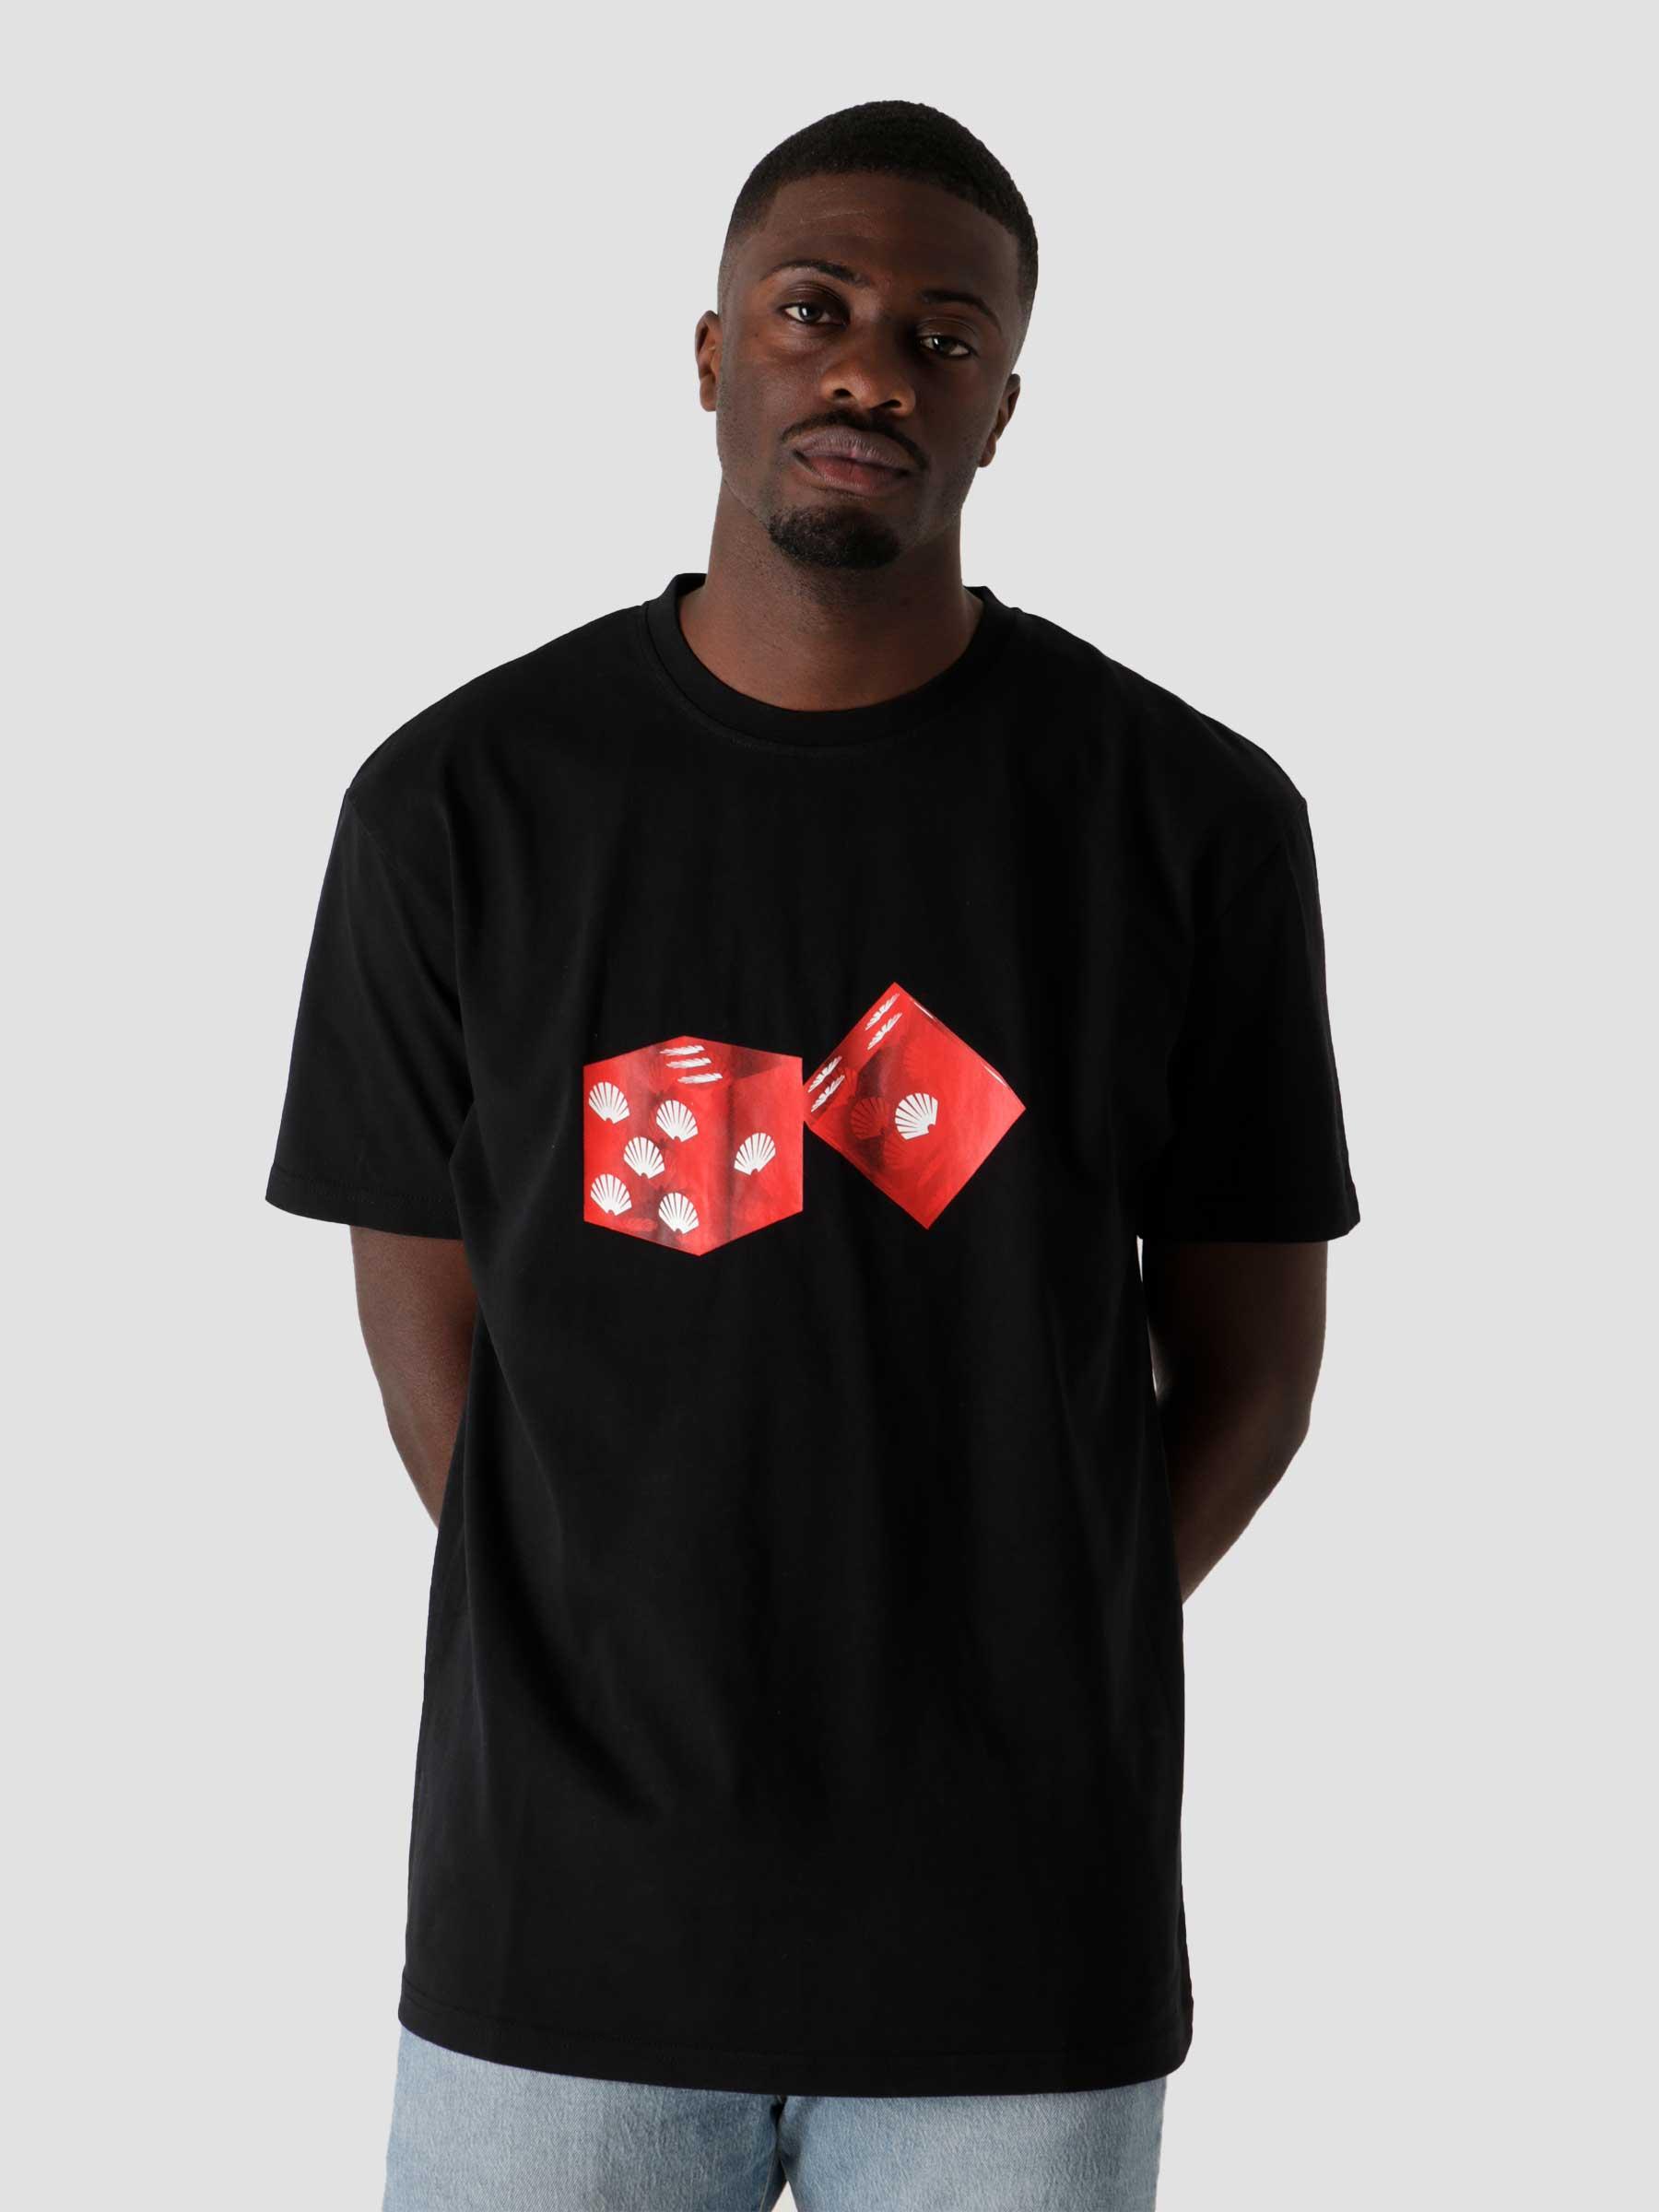 Dice T-Shirt Black 2021201